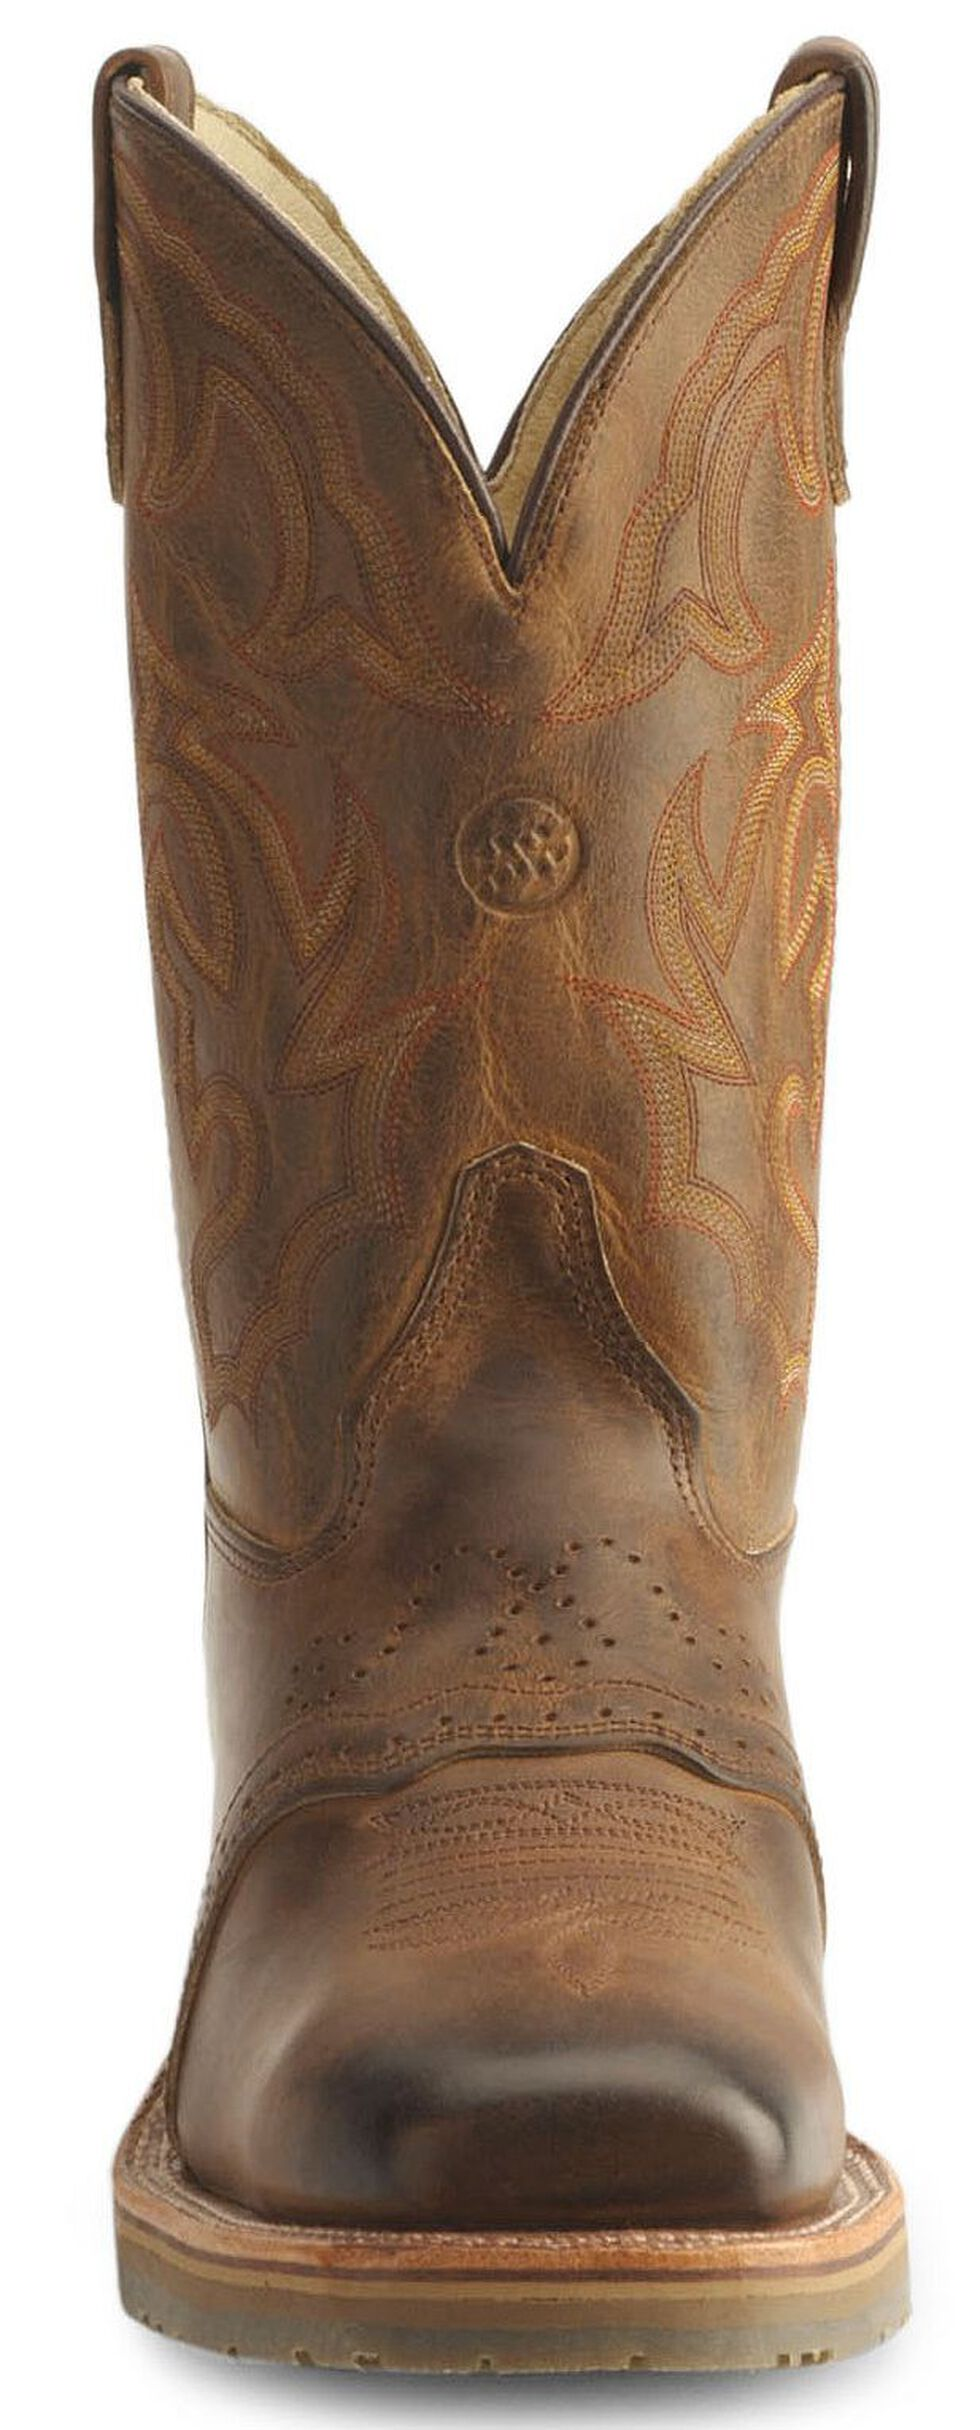 Double H Roper Cowboy Work Boots - Square Steel Toe, Bark, hi-res